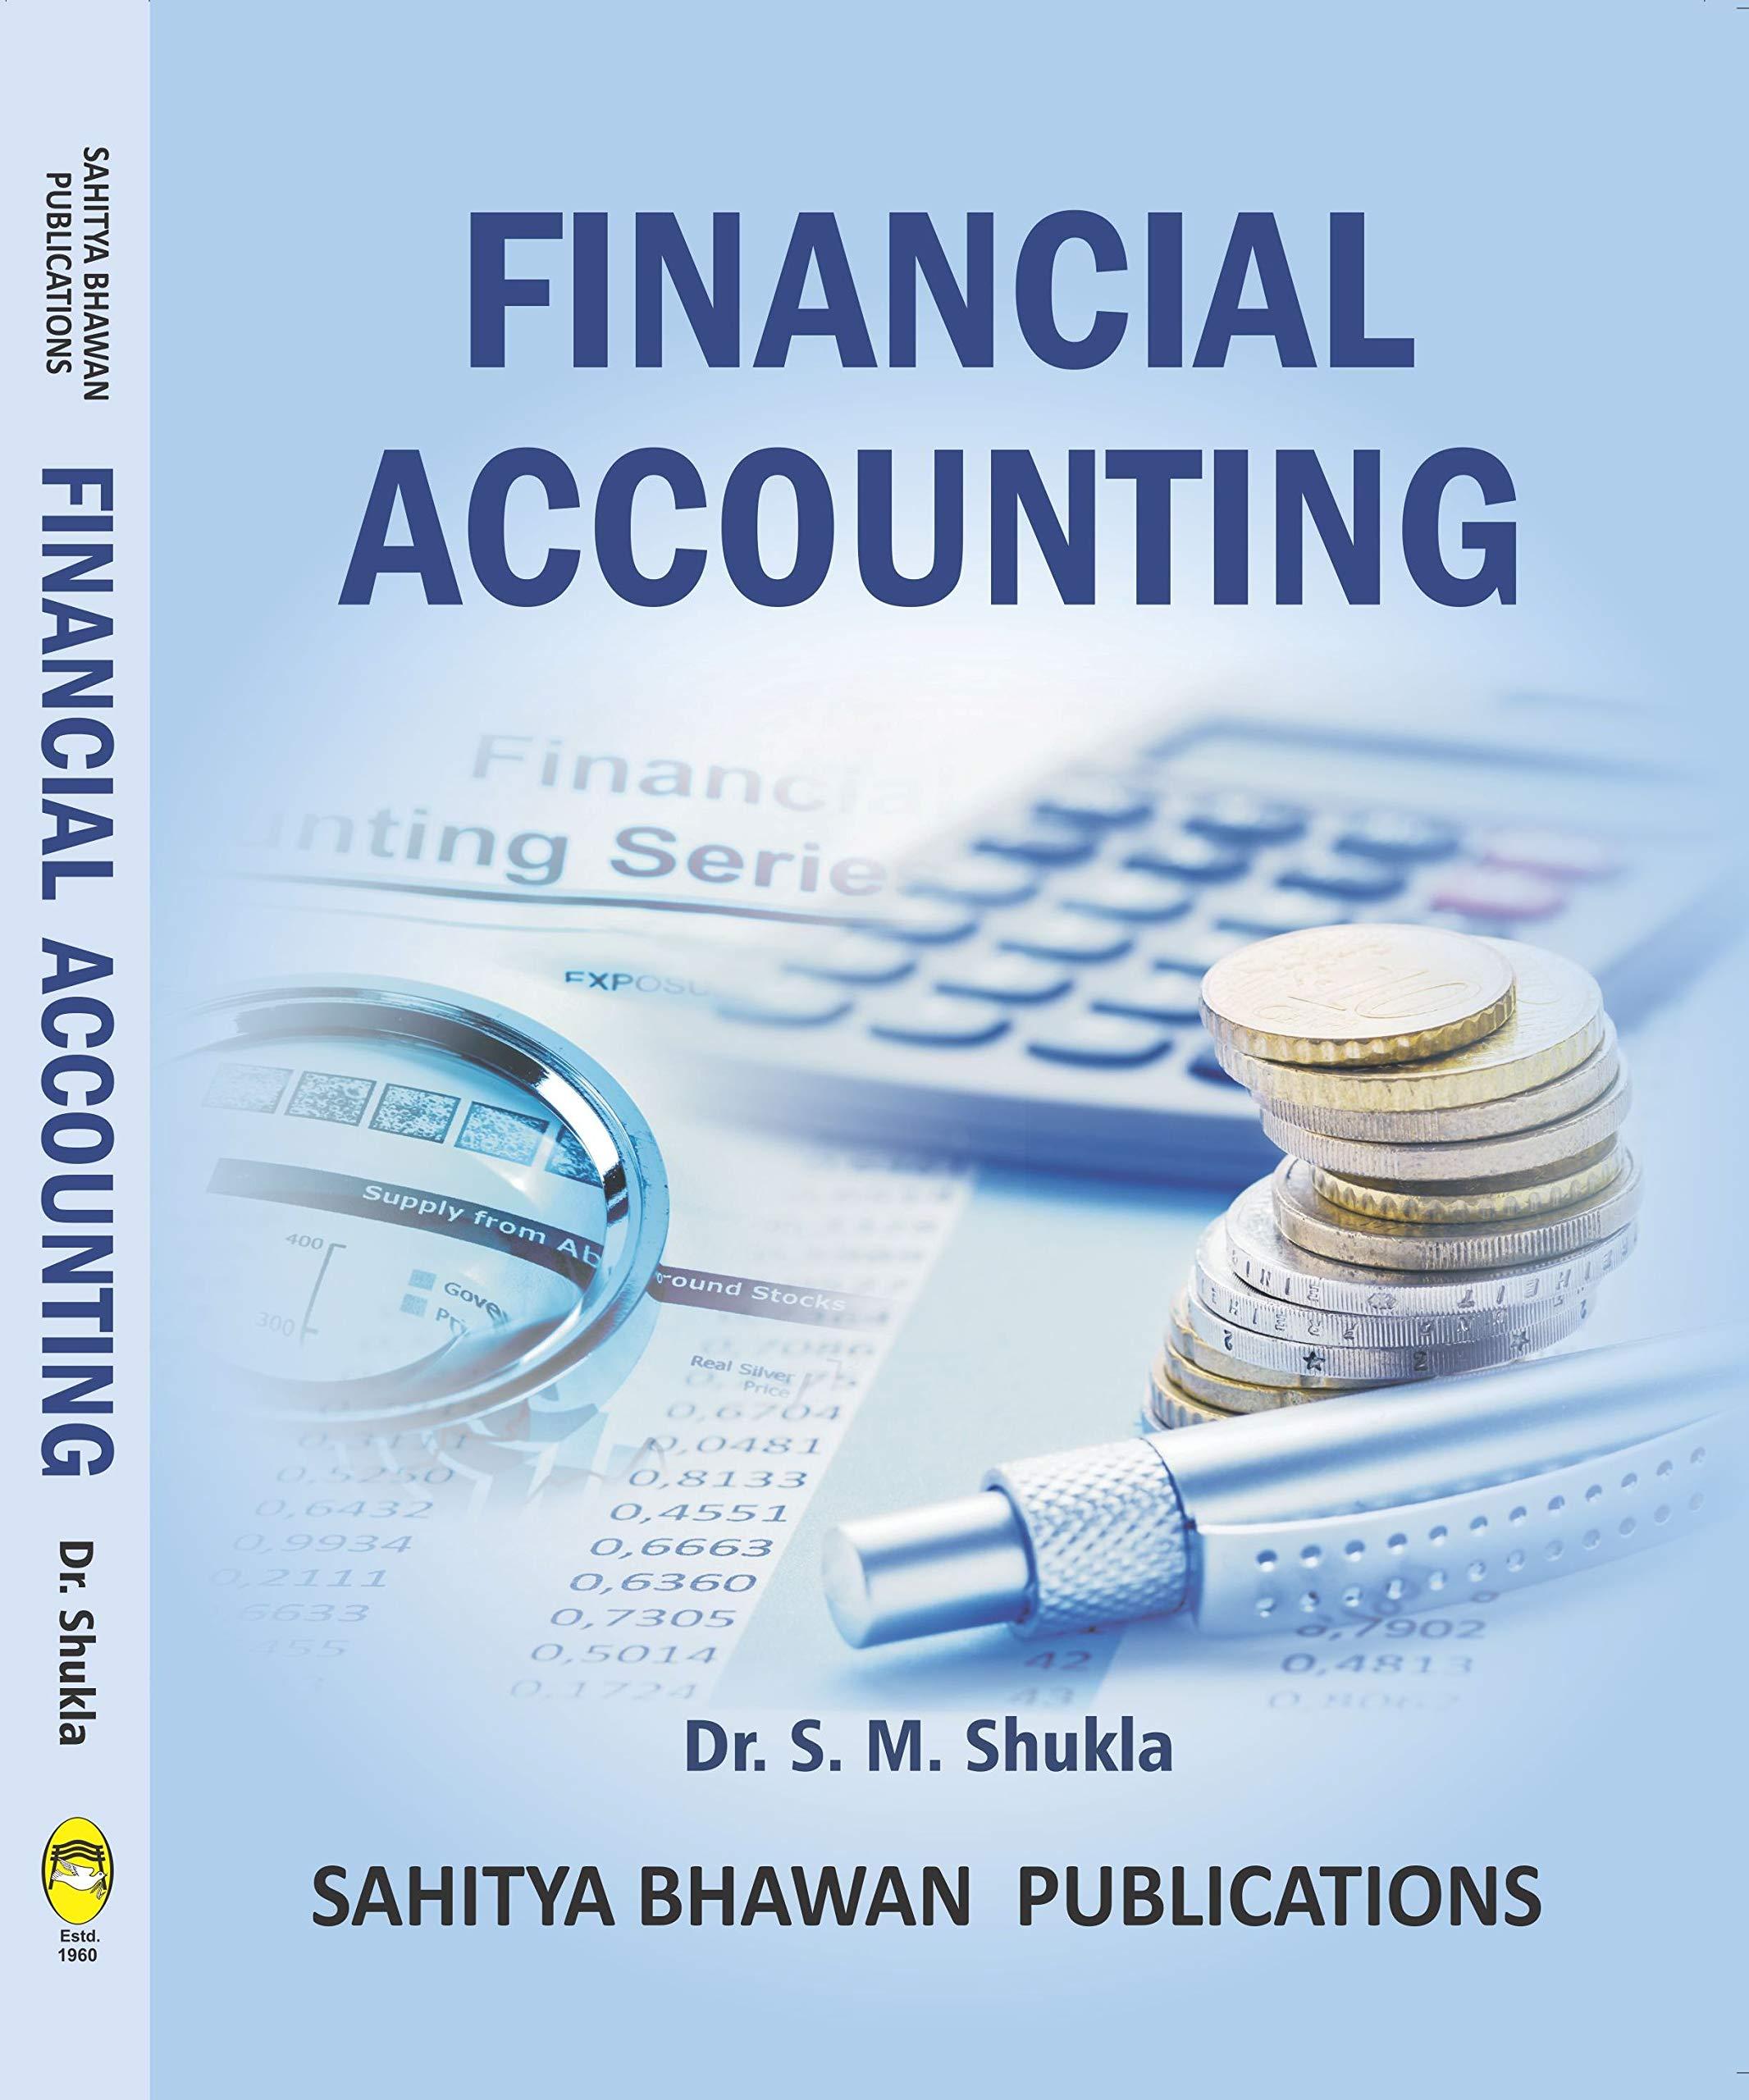 Financial Accounting B.Com First Year CCS University Meerut New syllabus Academic Year 2019-20